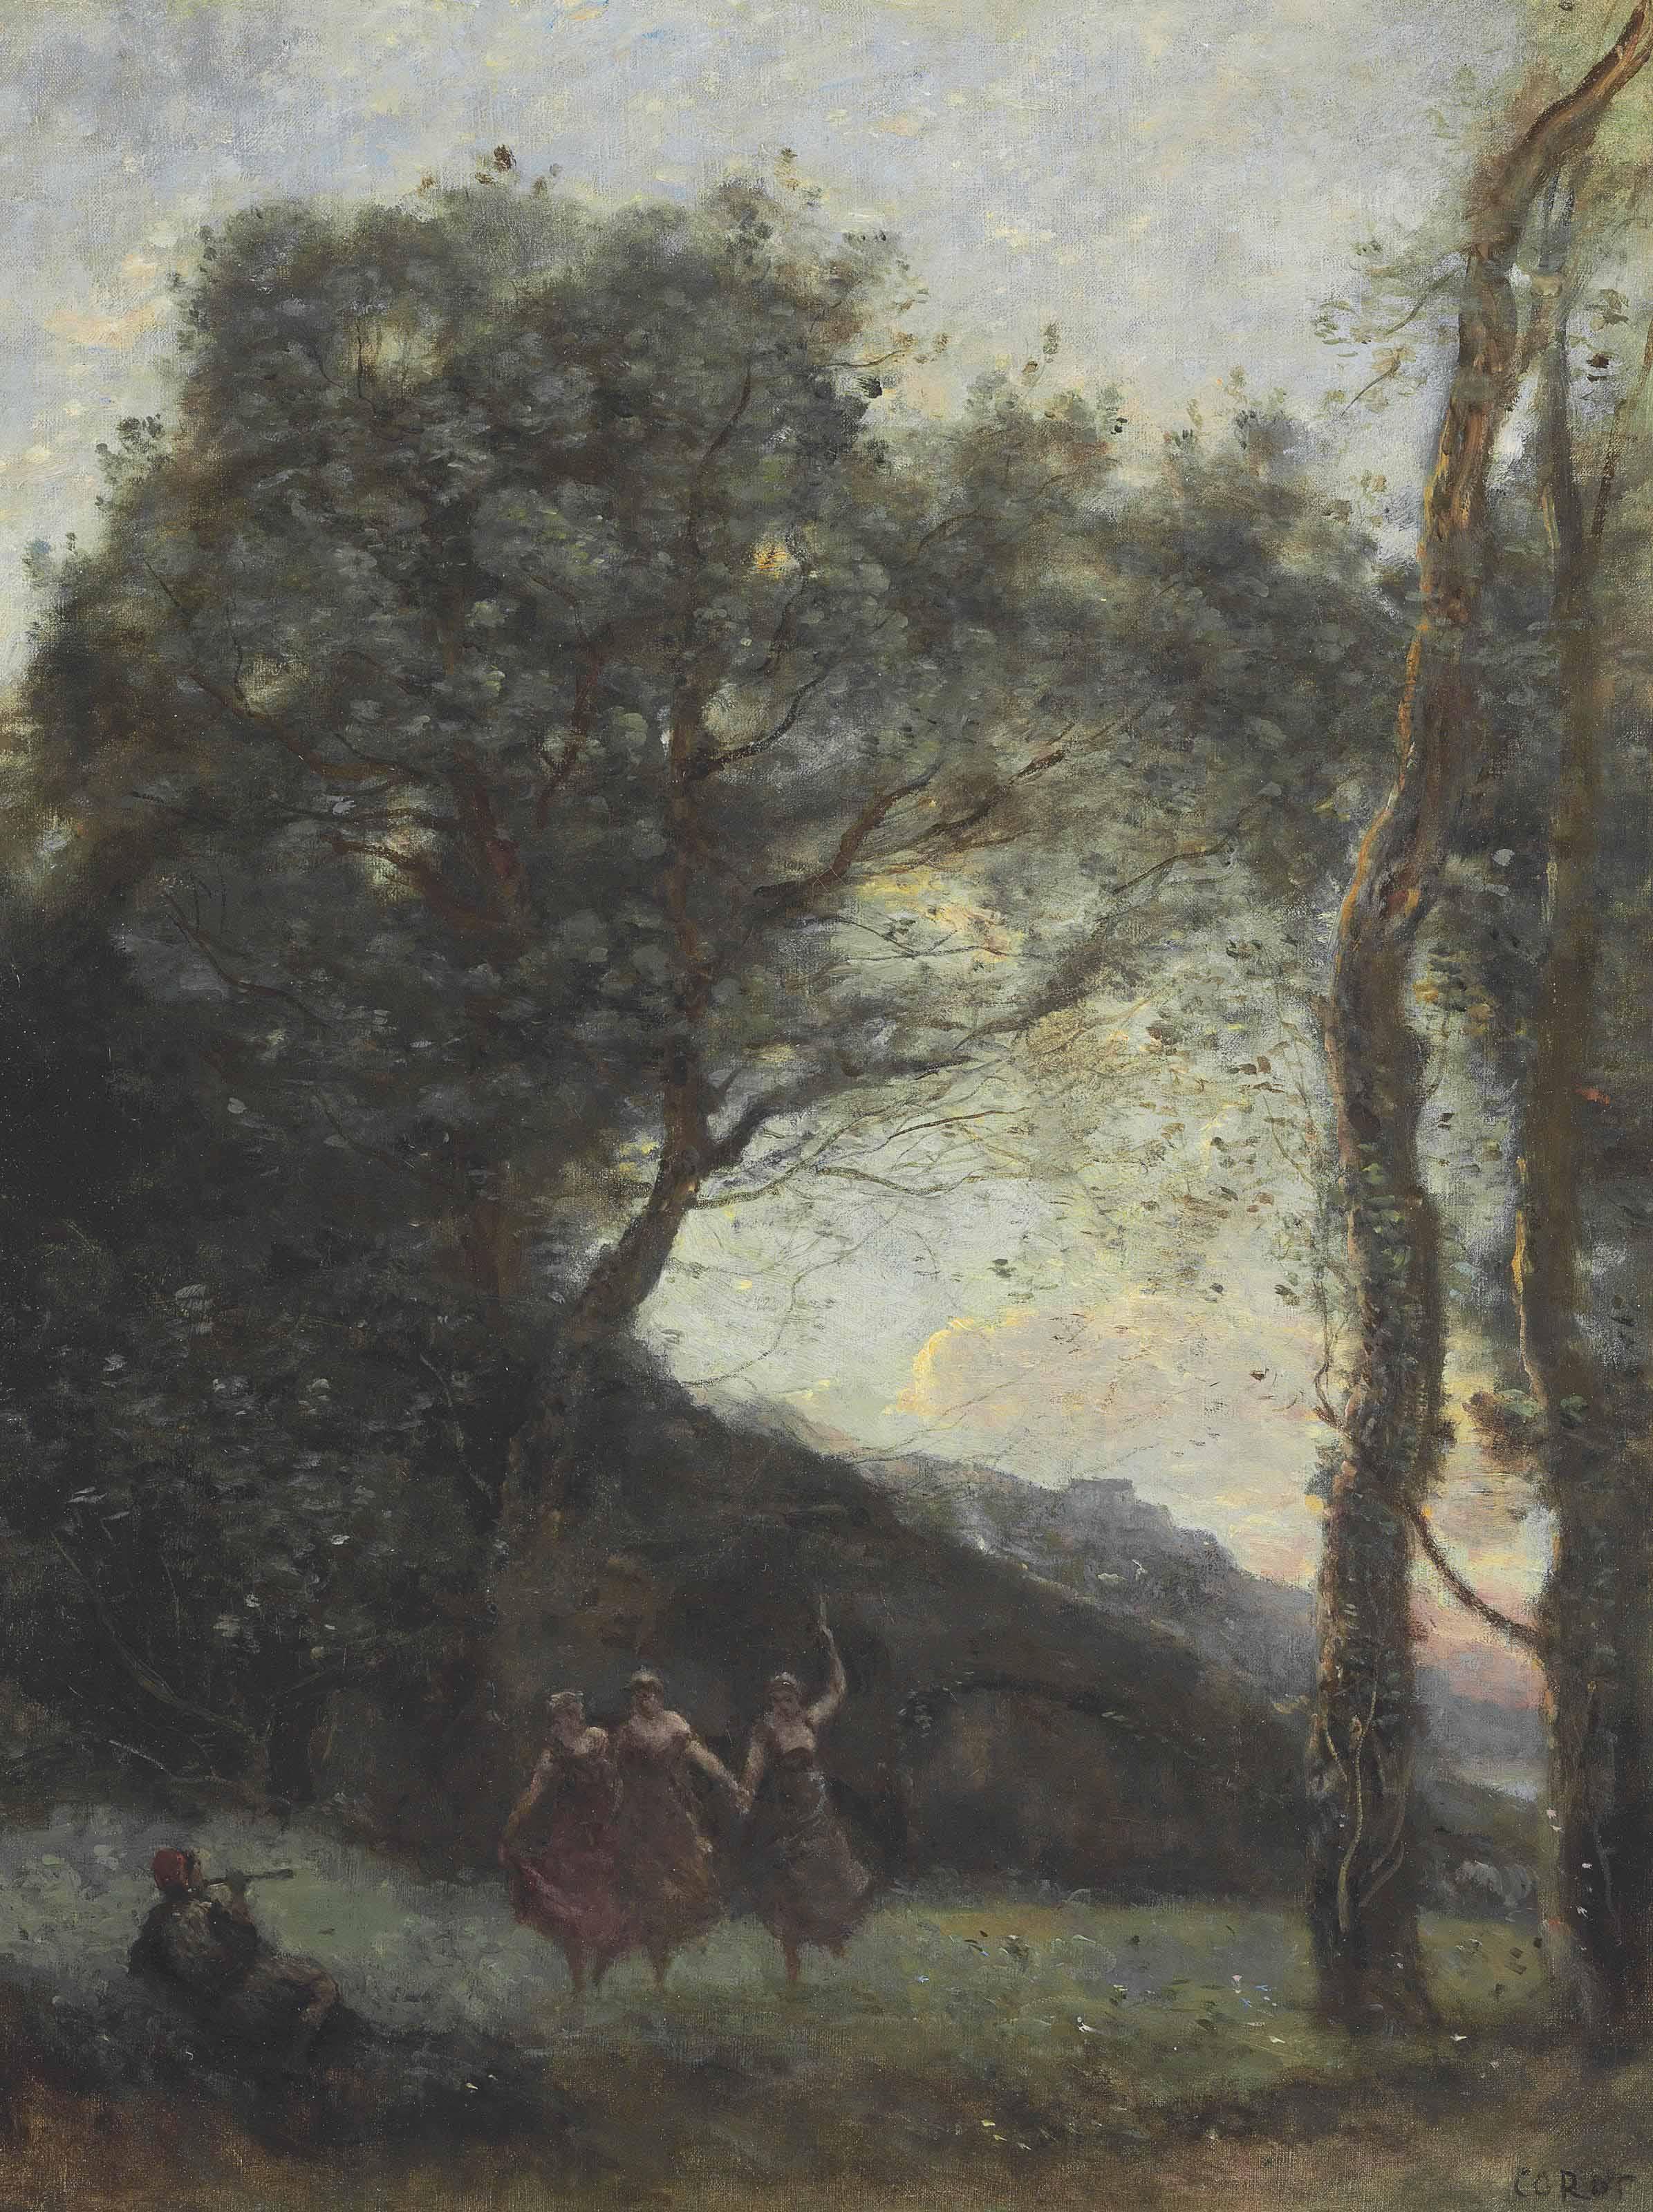 Jean Baptiste Corot Paintings For Sale